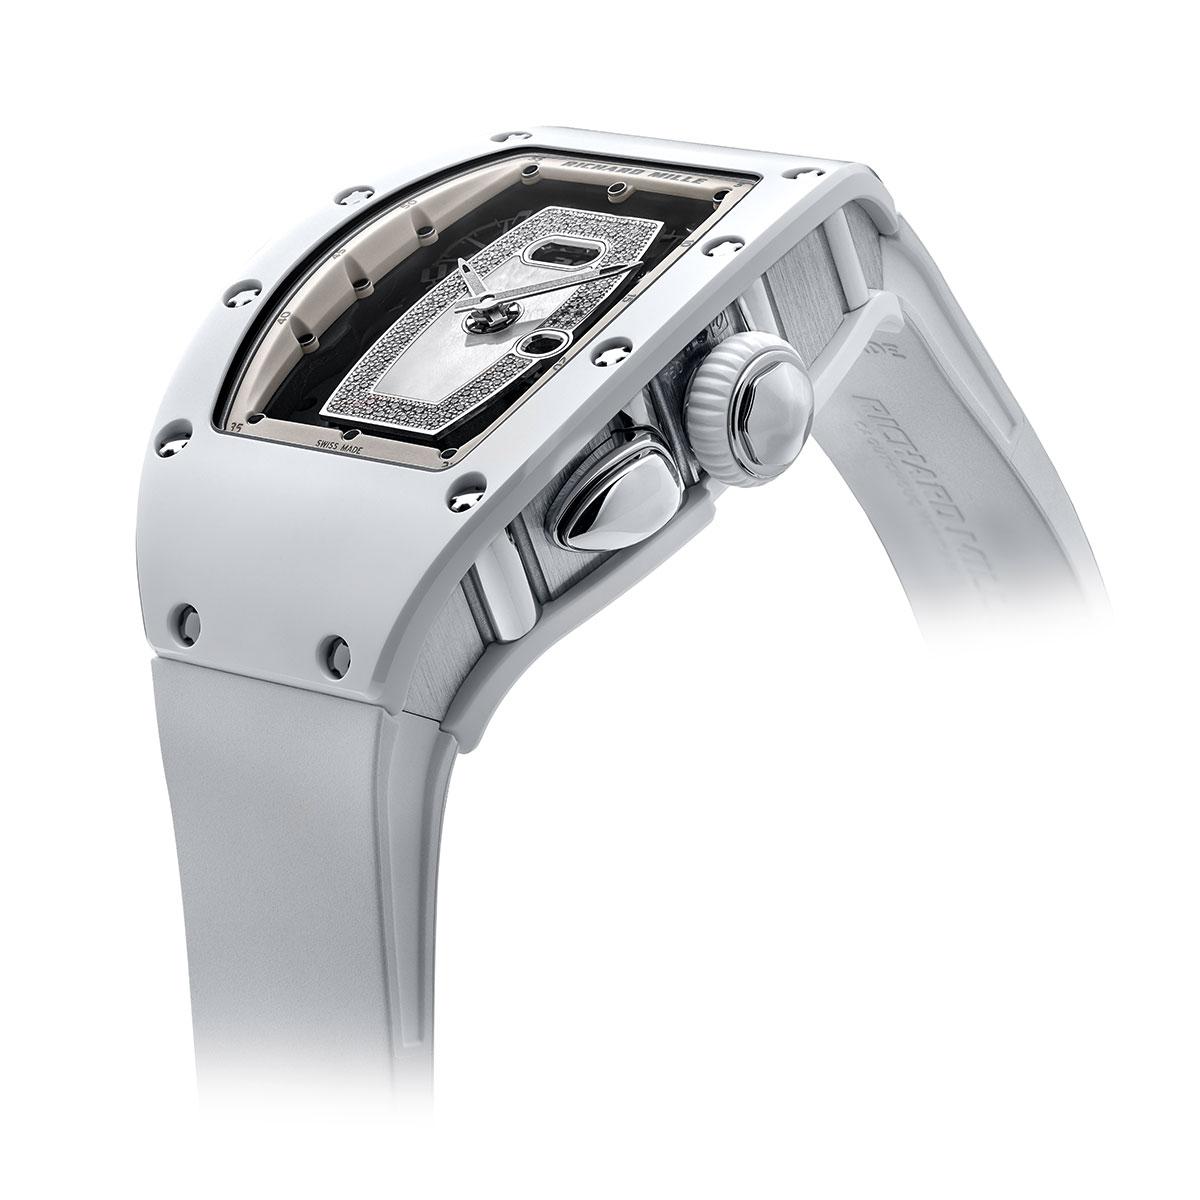 Đồng hồ Richard Mille RM 037 White Ceramic Automatic 3